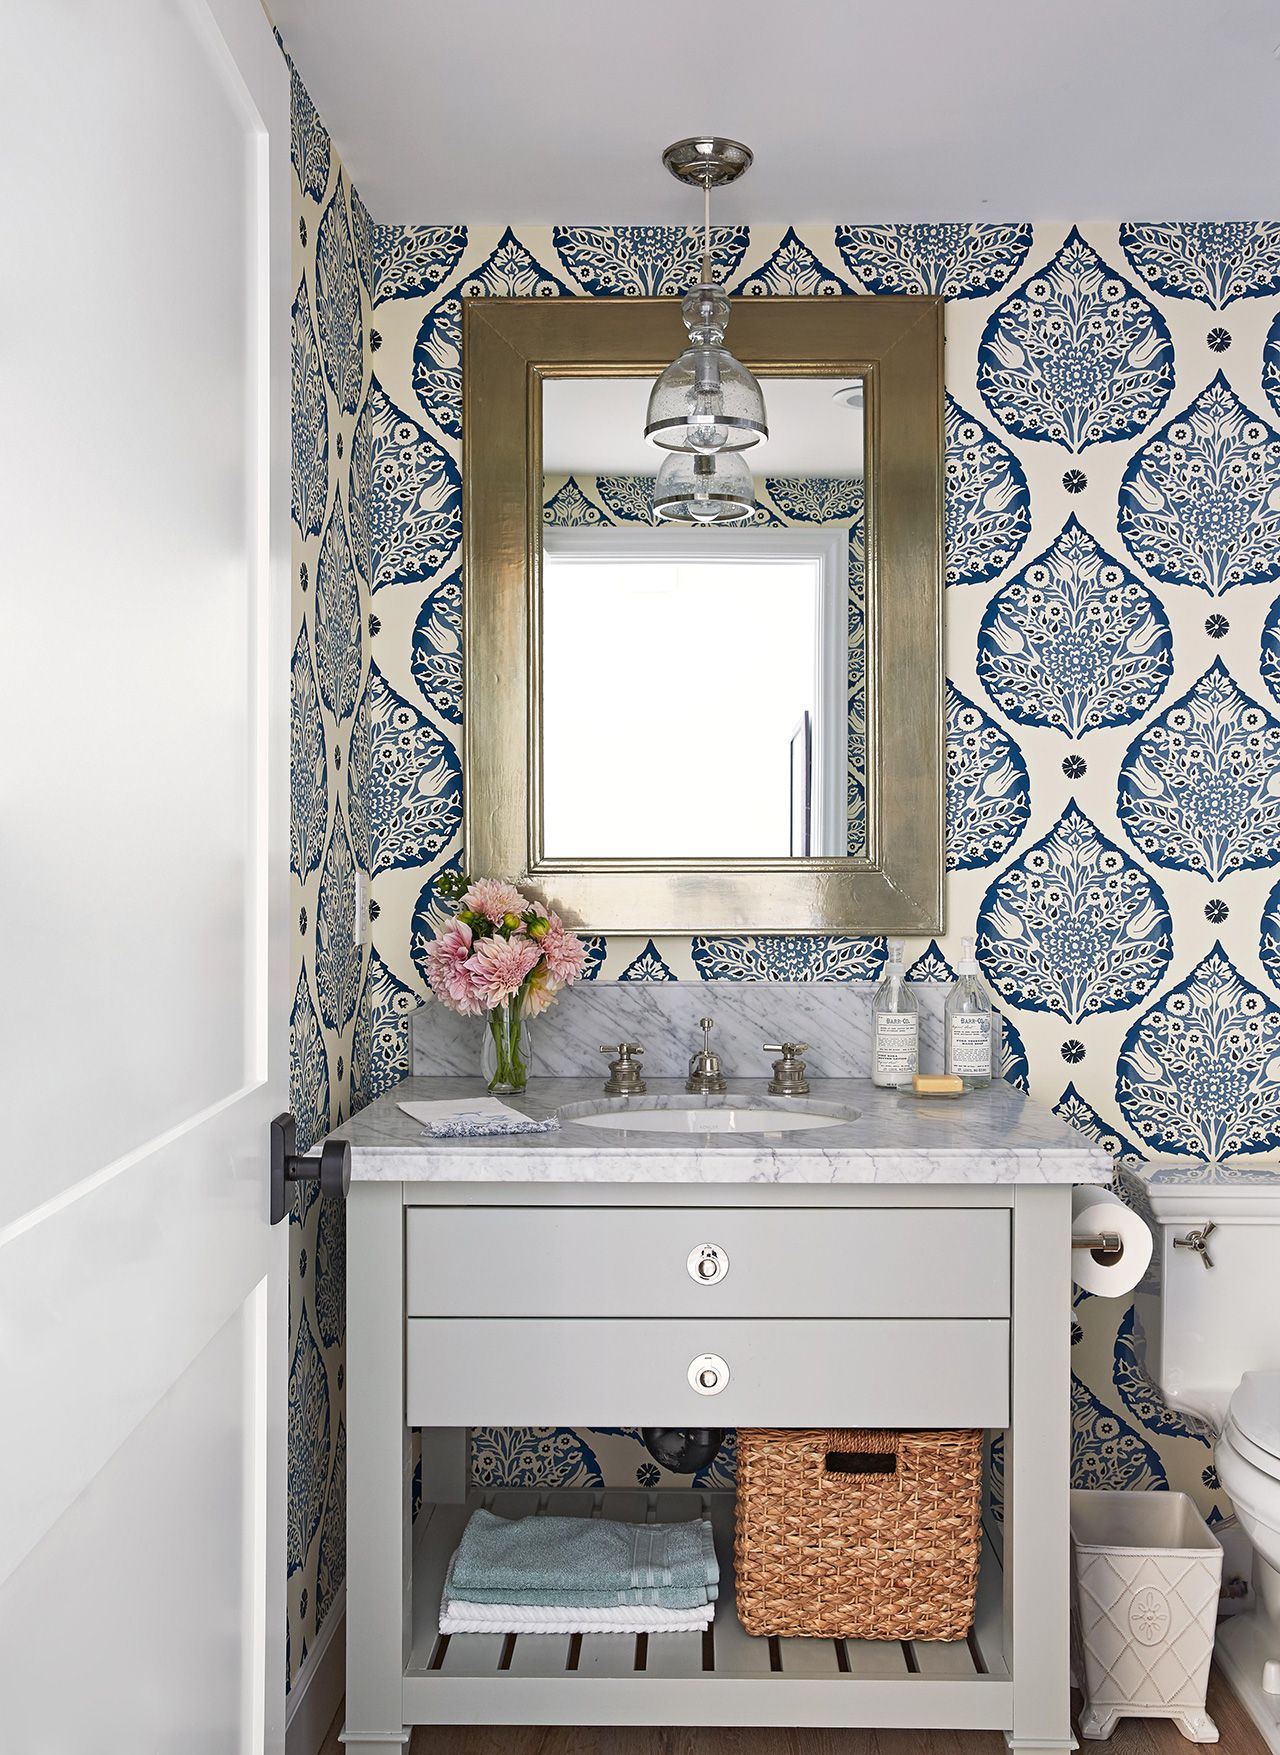 17 Money Saving Tips To Stretch Your Small Bathroom Budget Half Bathroom Decor Small Bathroom Vanities Kid Bathroom Decor [ jpg ]